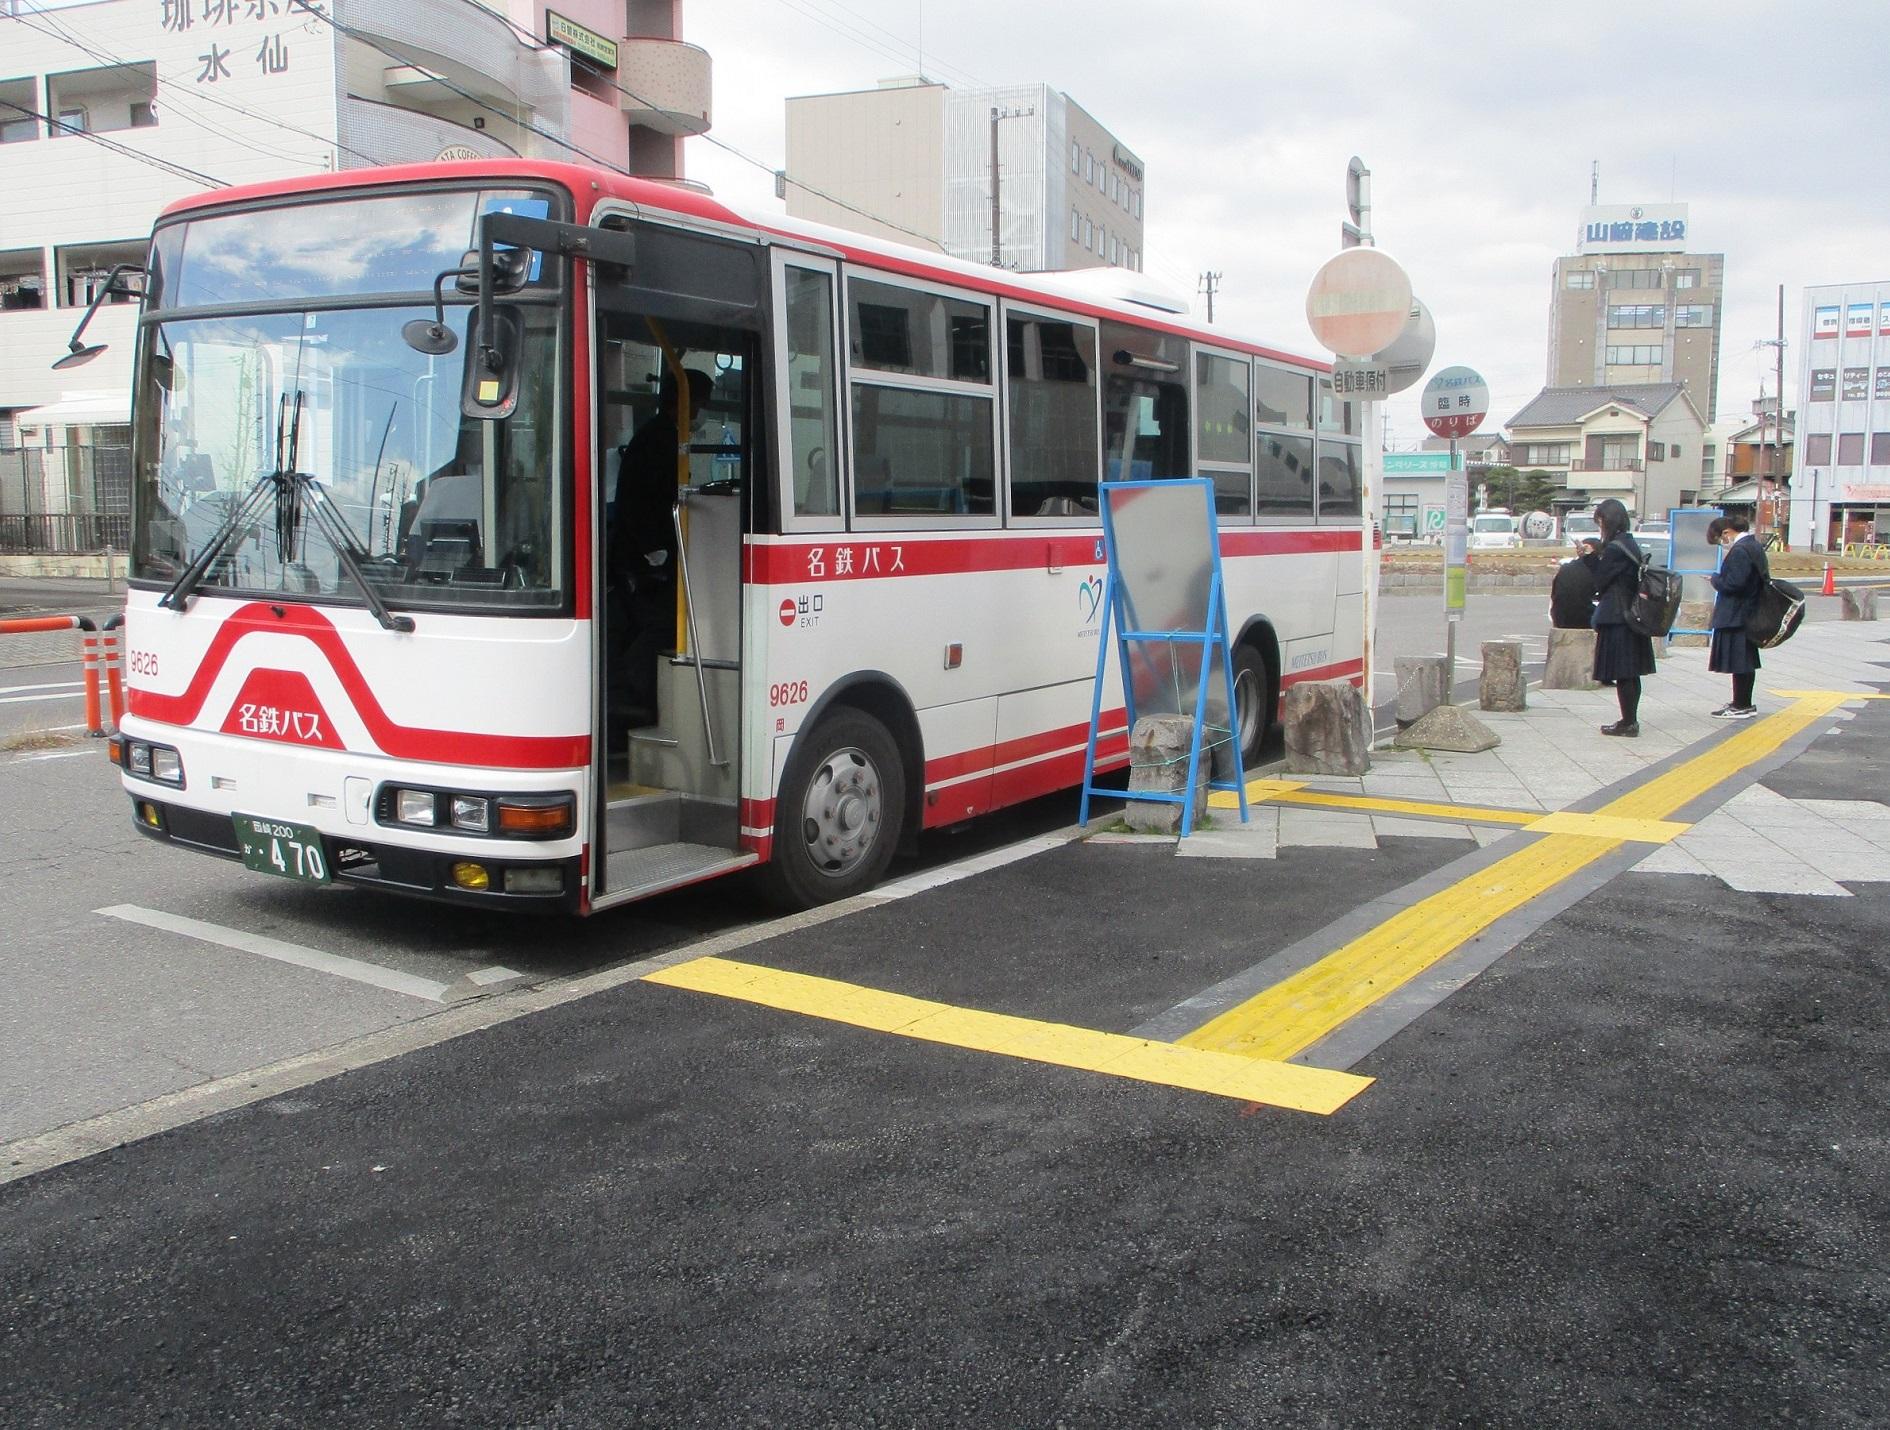 2020.2.26 (57) JR岡崎駅西口 - JR岡崎駅西口いきバス 1890-1430